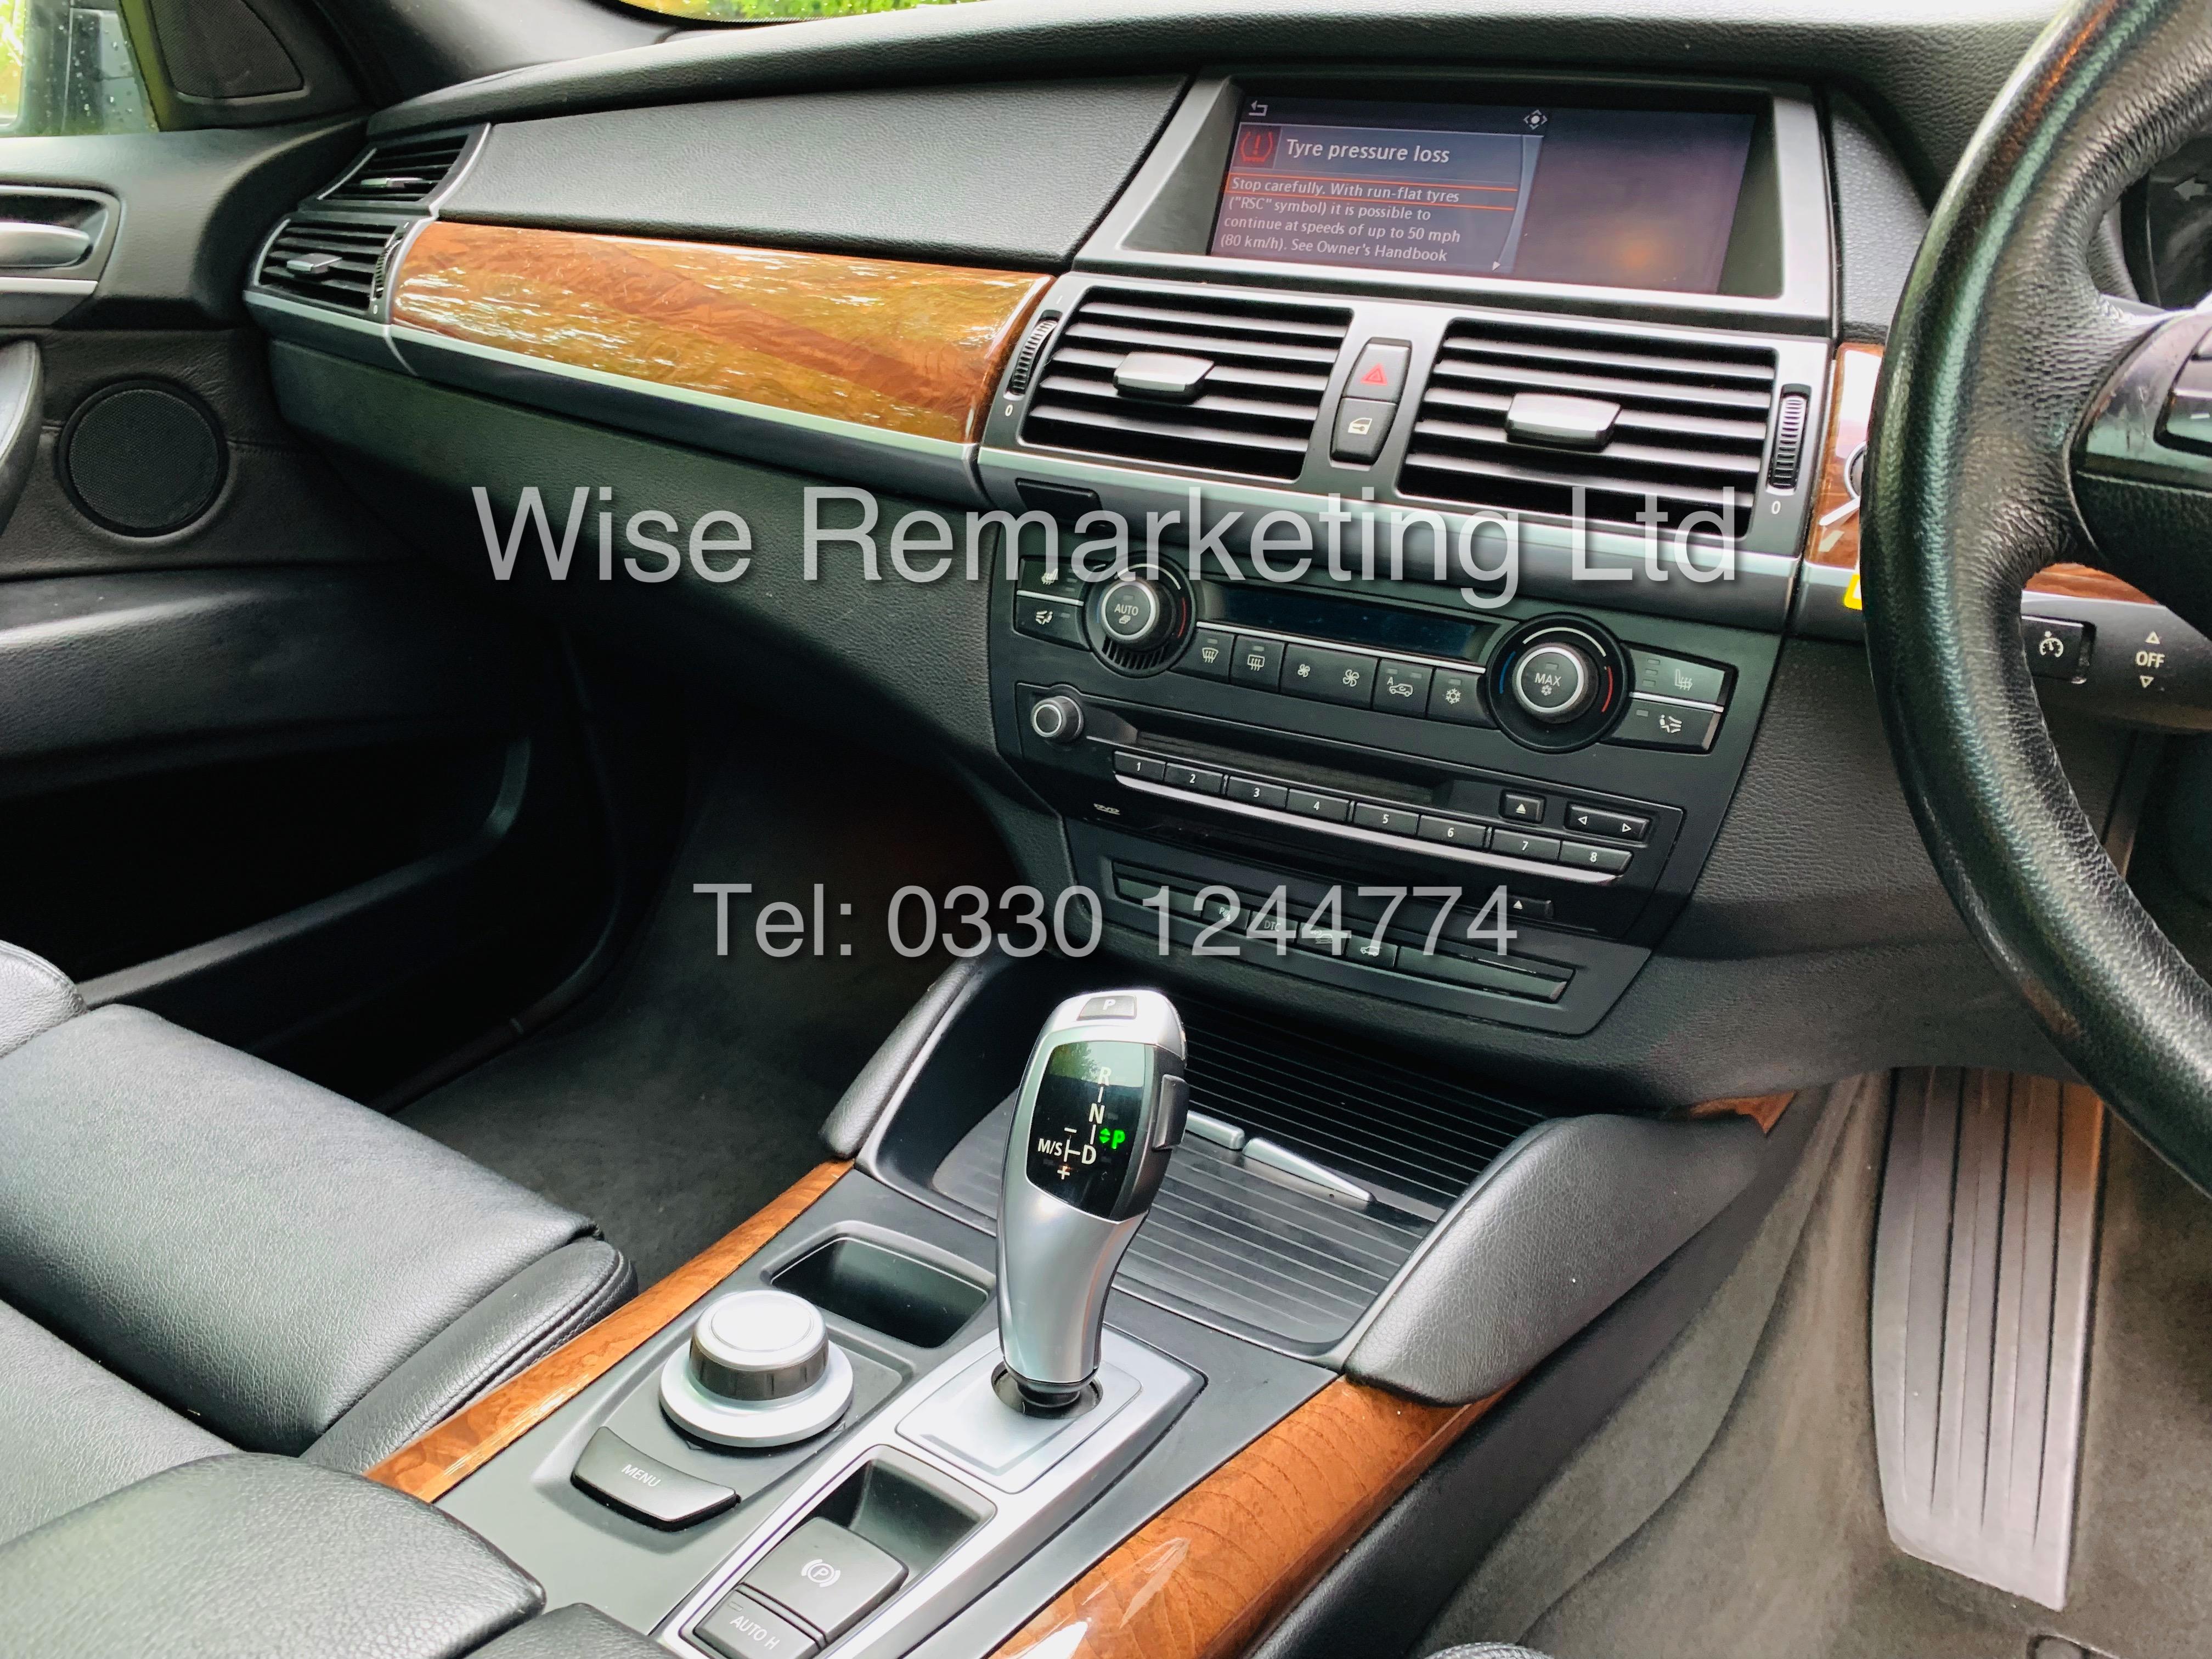 BMW X6 XDRIVE 35D AUTO (2009 SPEC) *1 PREVIOUS OWNER* PARKING AID - SAT NAV - FSH - Image 17 of 25